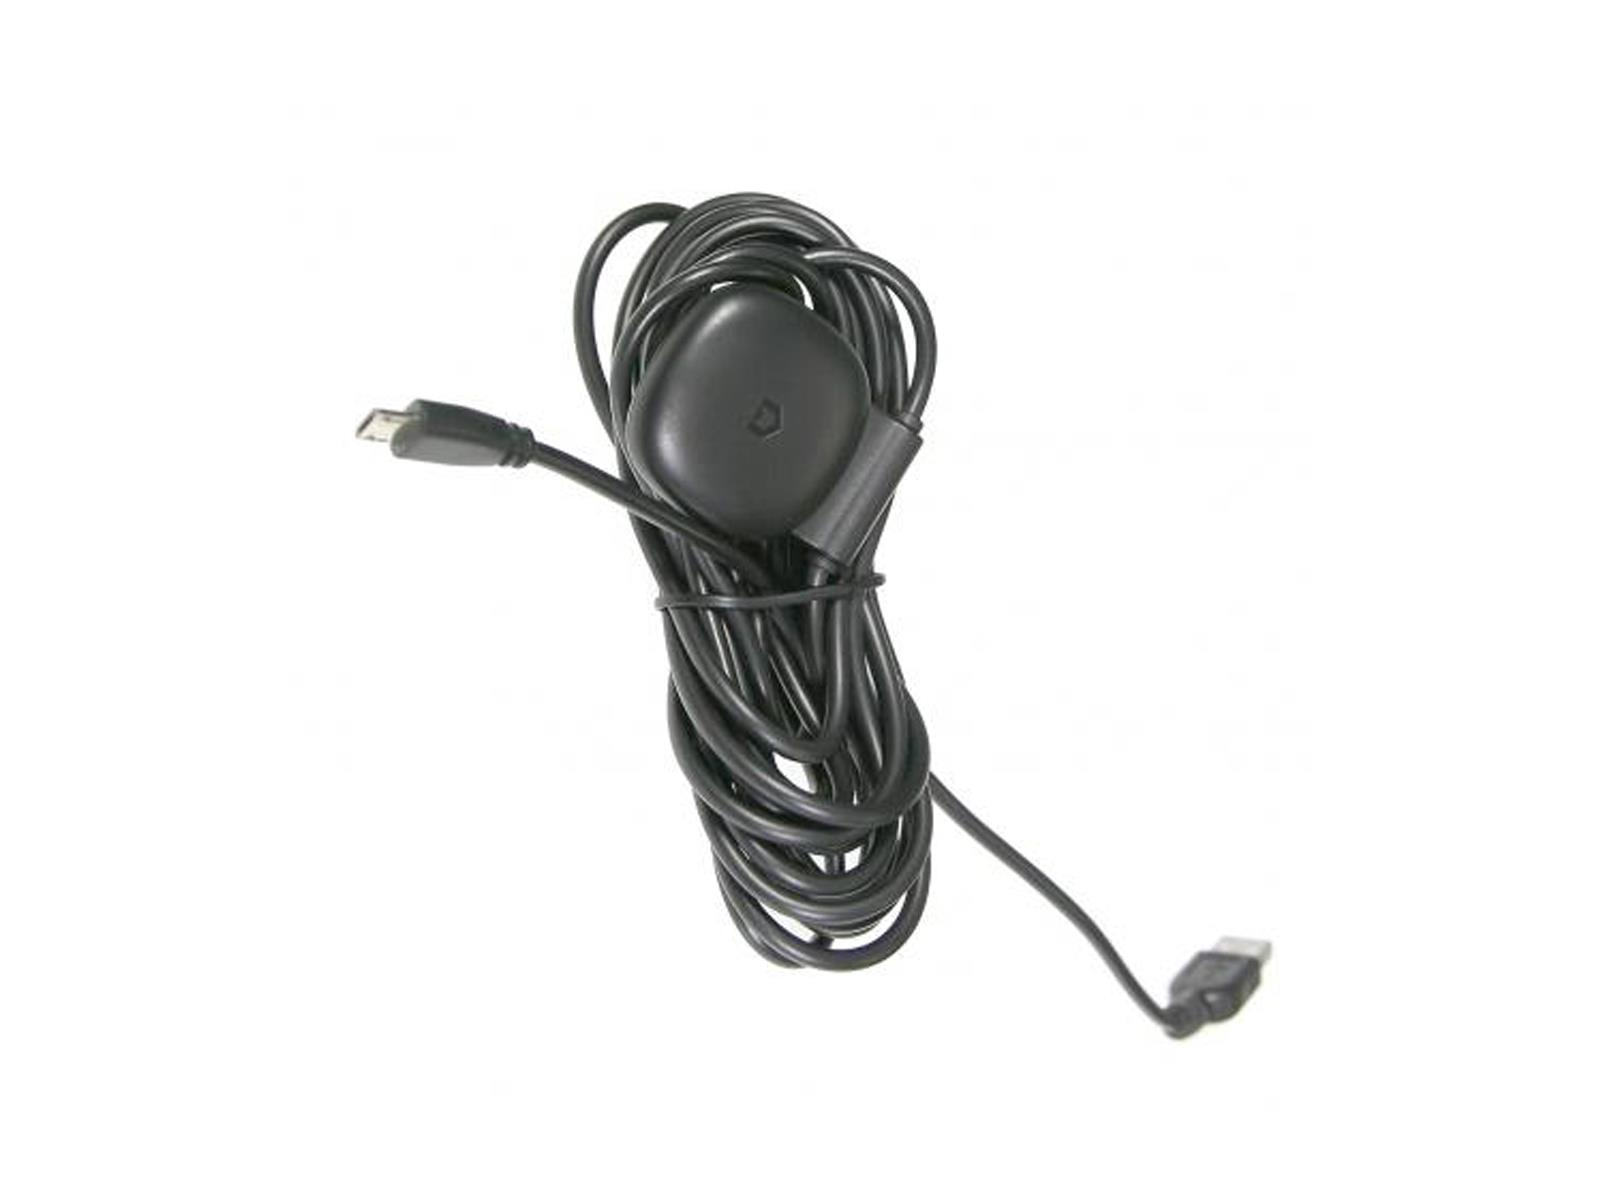 Gator dashcam External GPS antenna tbv 675102900